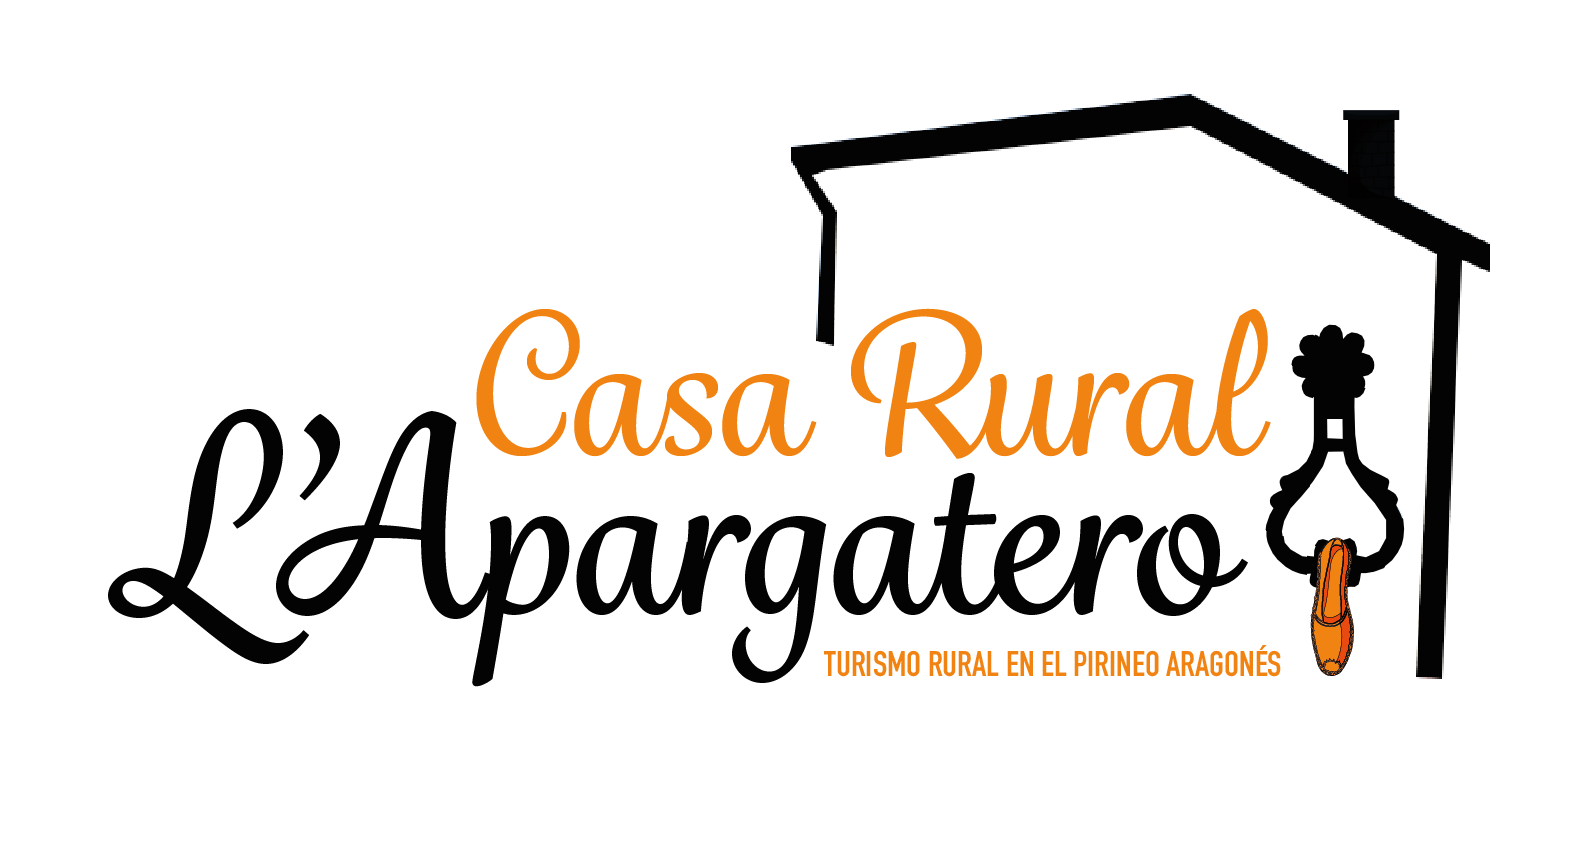 Casa Rural l'Apargatero